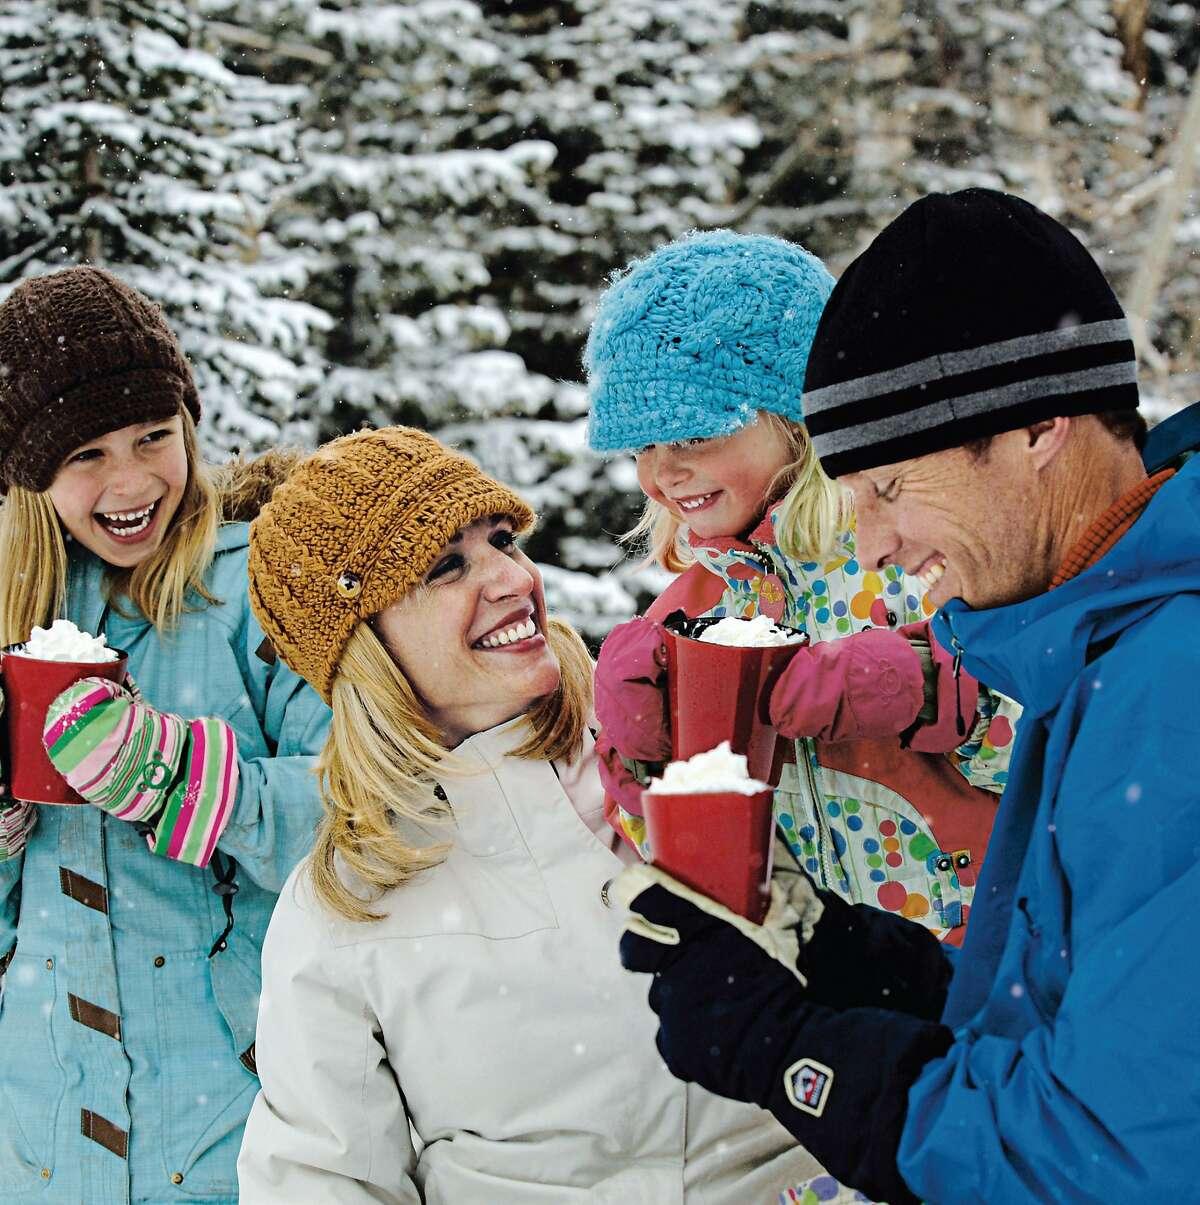 Steamboat Springs Ski Resort. Credit: Larry Pierce/Steamboat Ski Resort